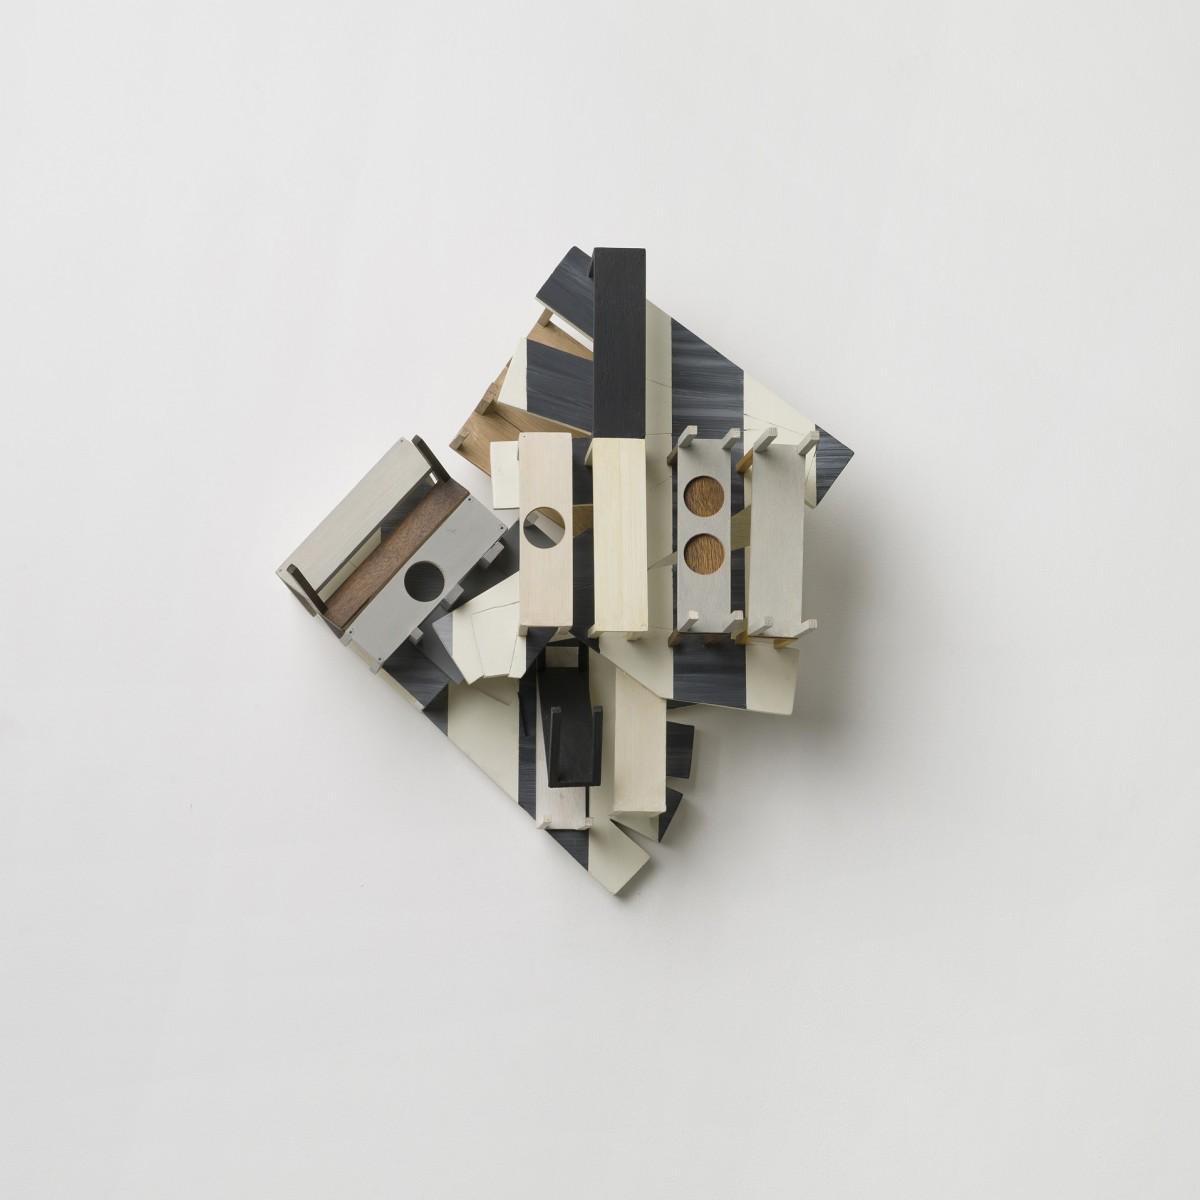 Nahum Tevet, Still Life with Stripes, 1992-2000, Acrylic and industrial paint on wood, 55x50x30 cm